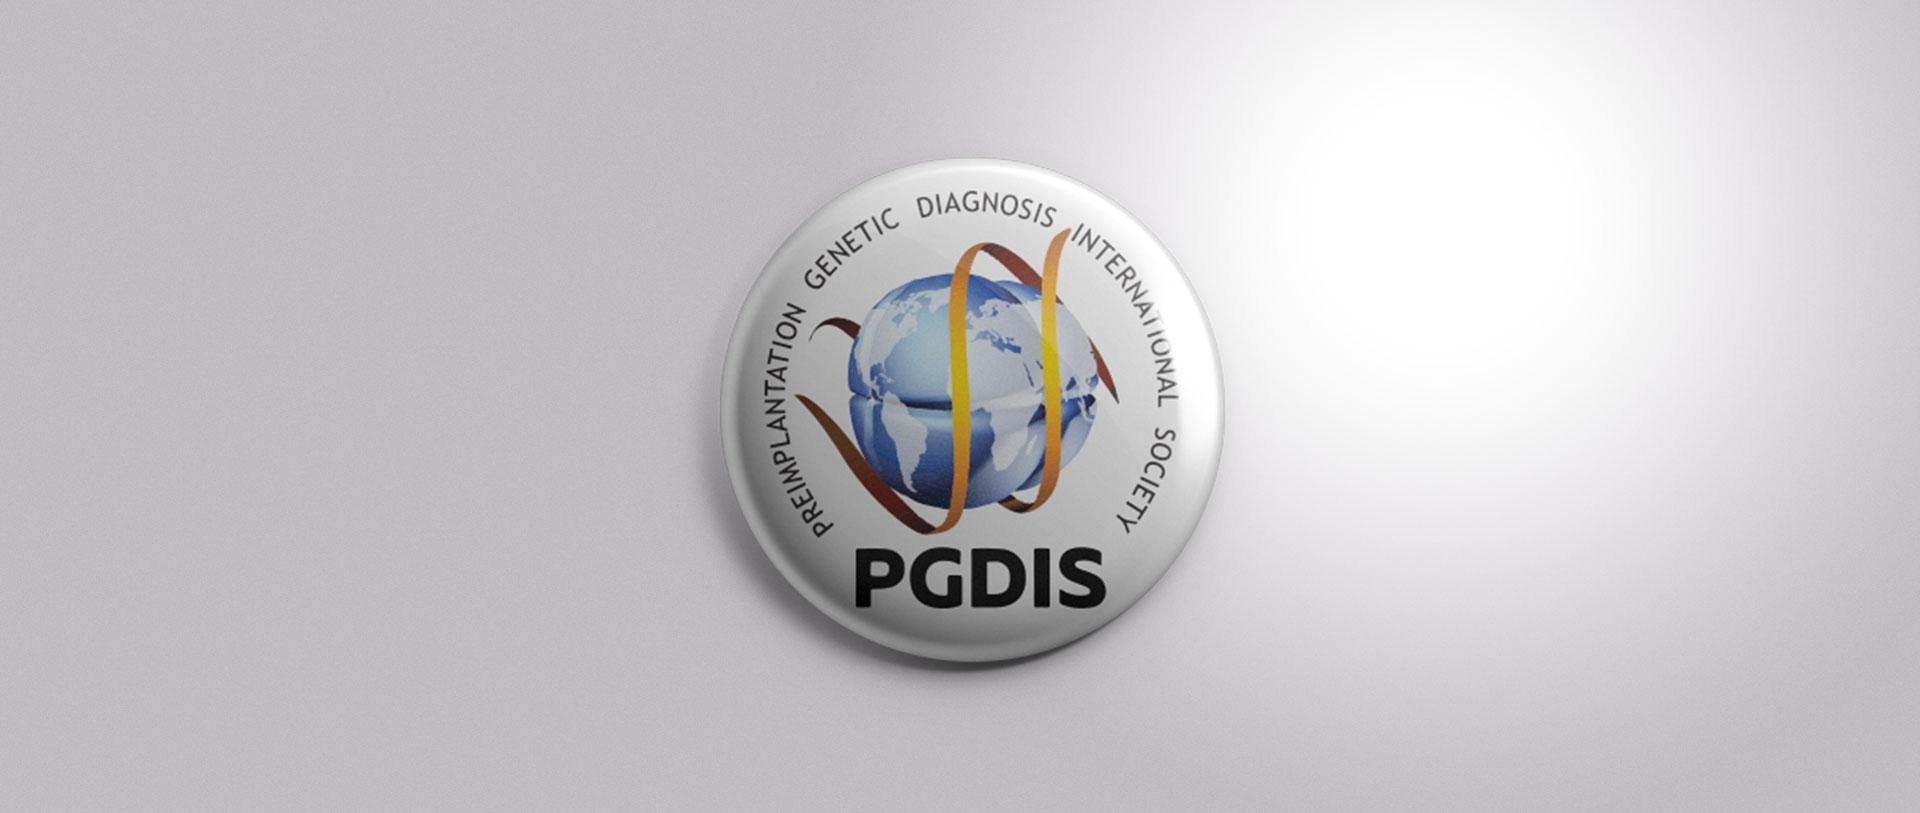 pgdis-logo-brand-isentity-revolando-06